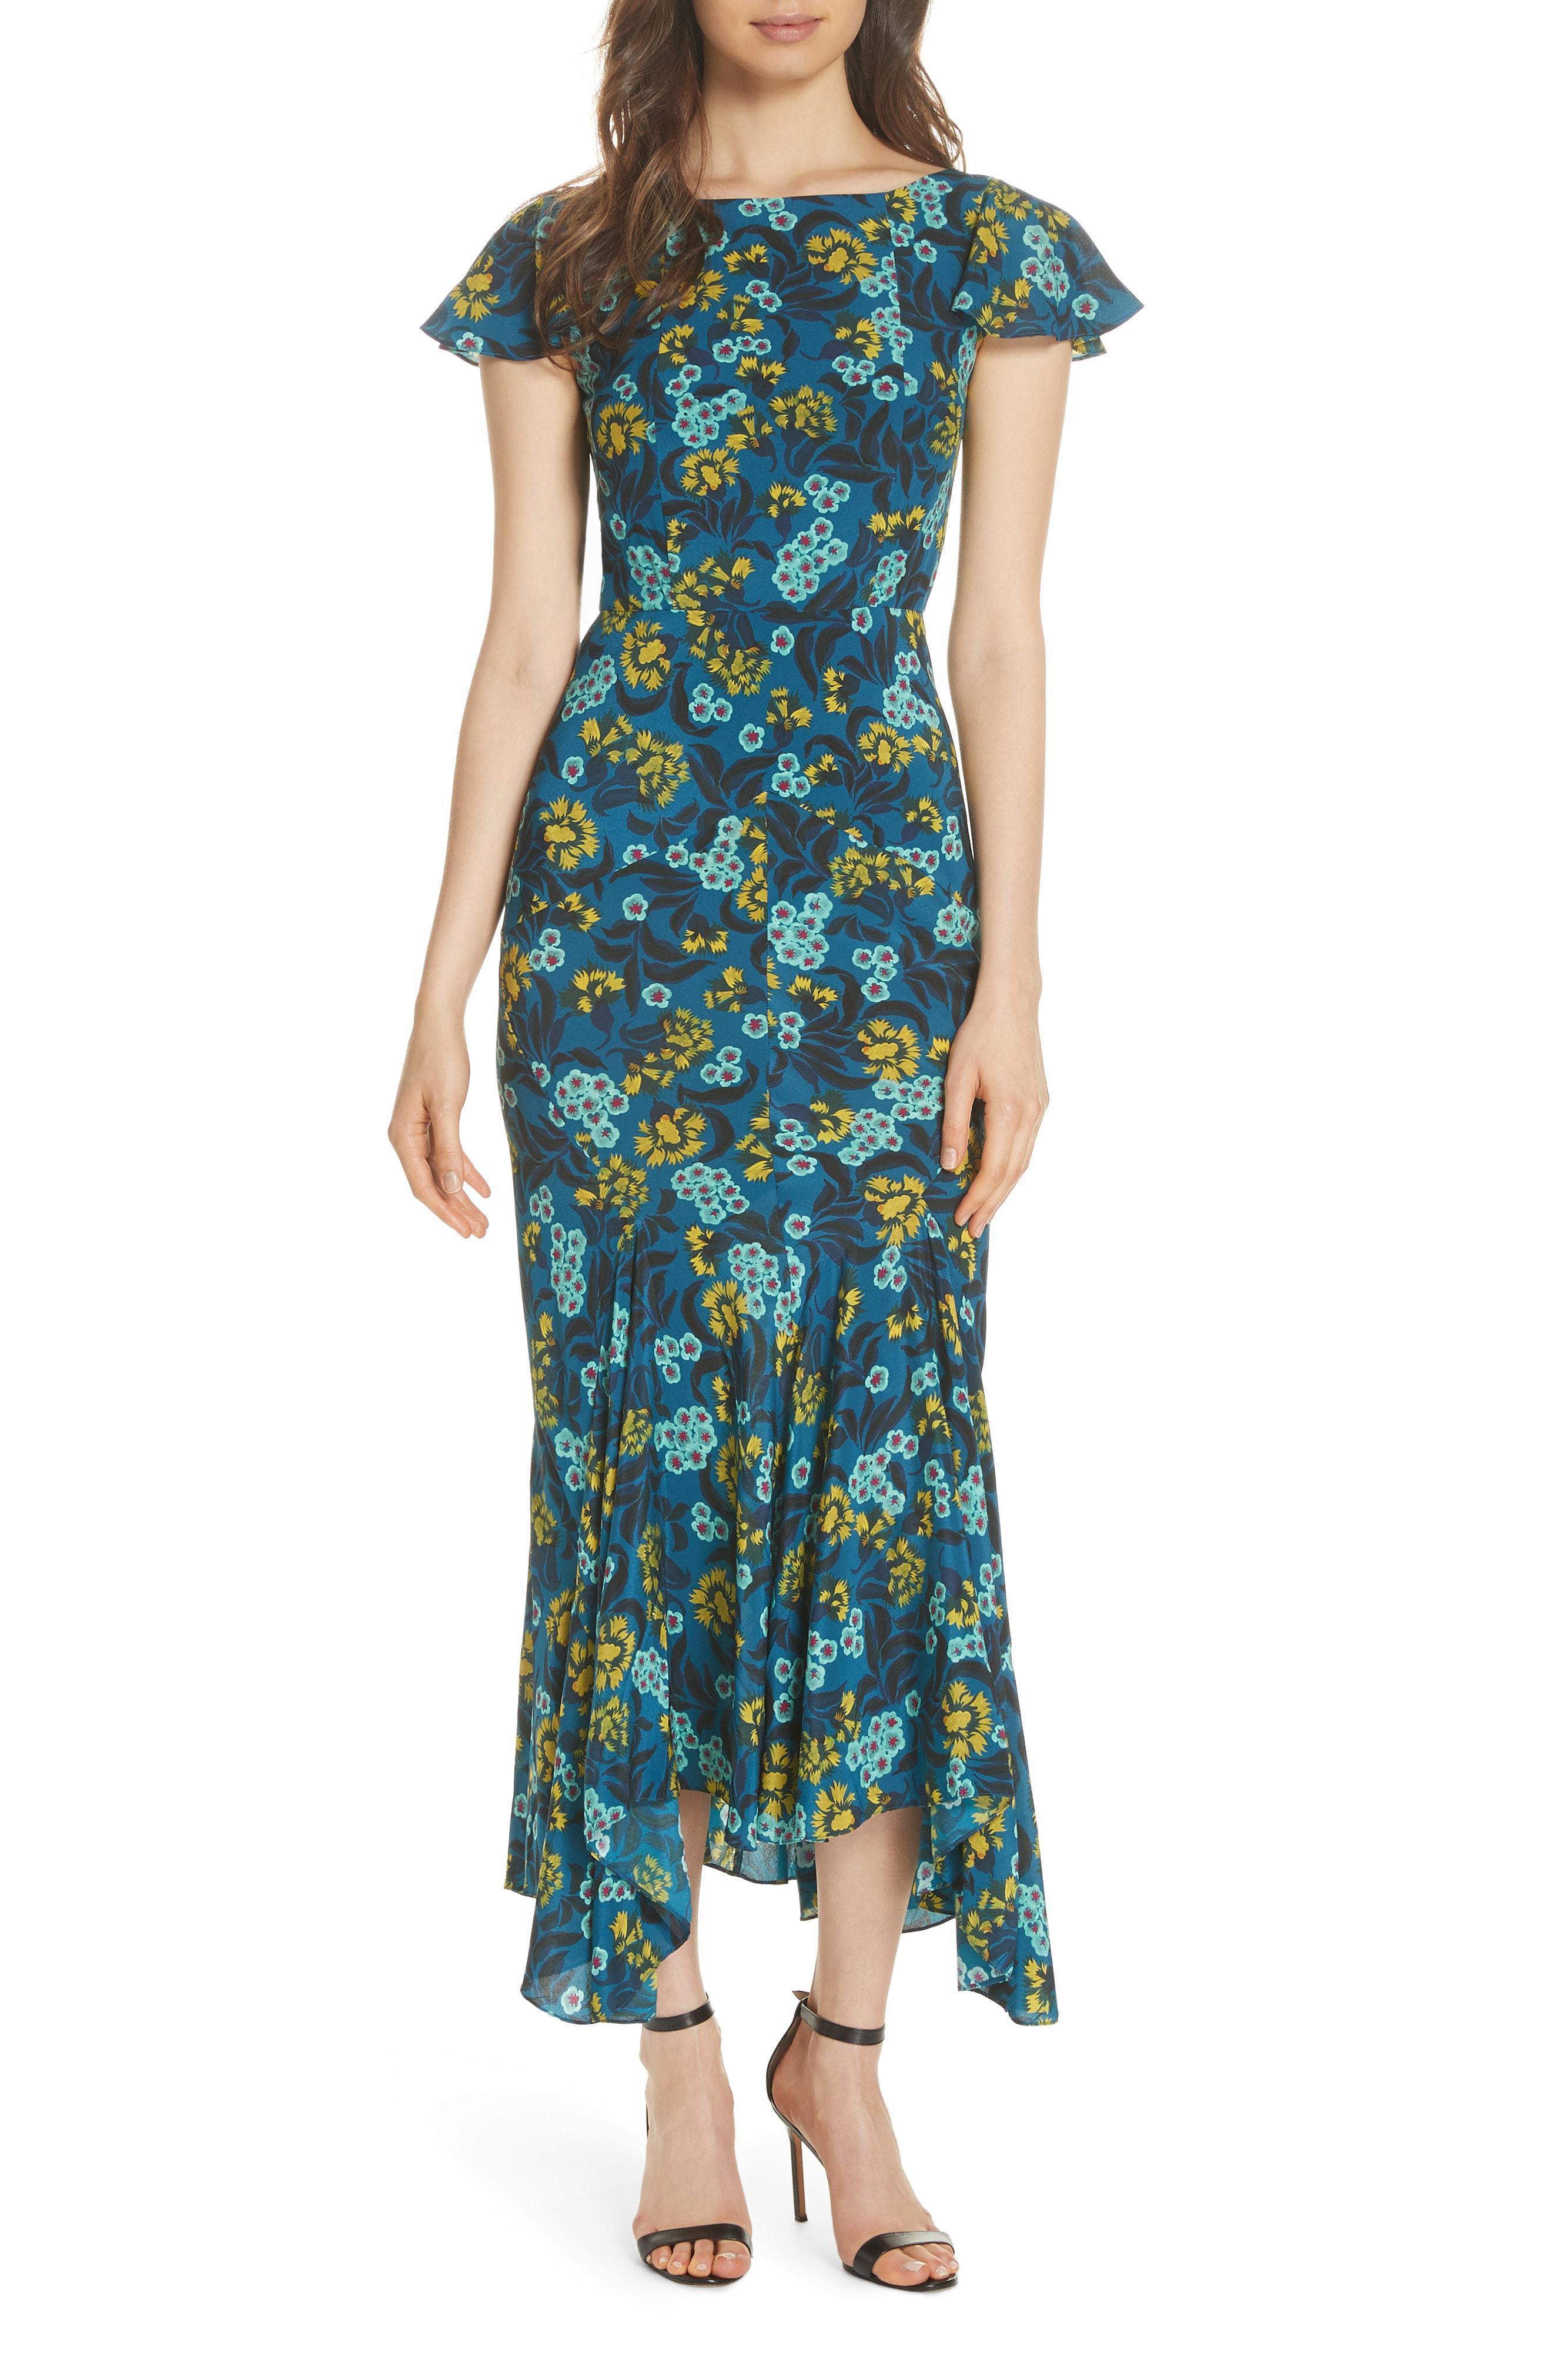 aef9eec9f015 Saloni Daphne Azalea Print Dress in Blue - Lyst